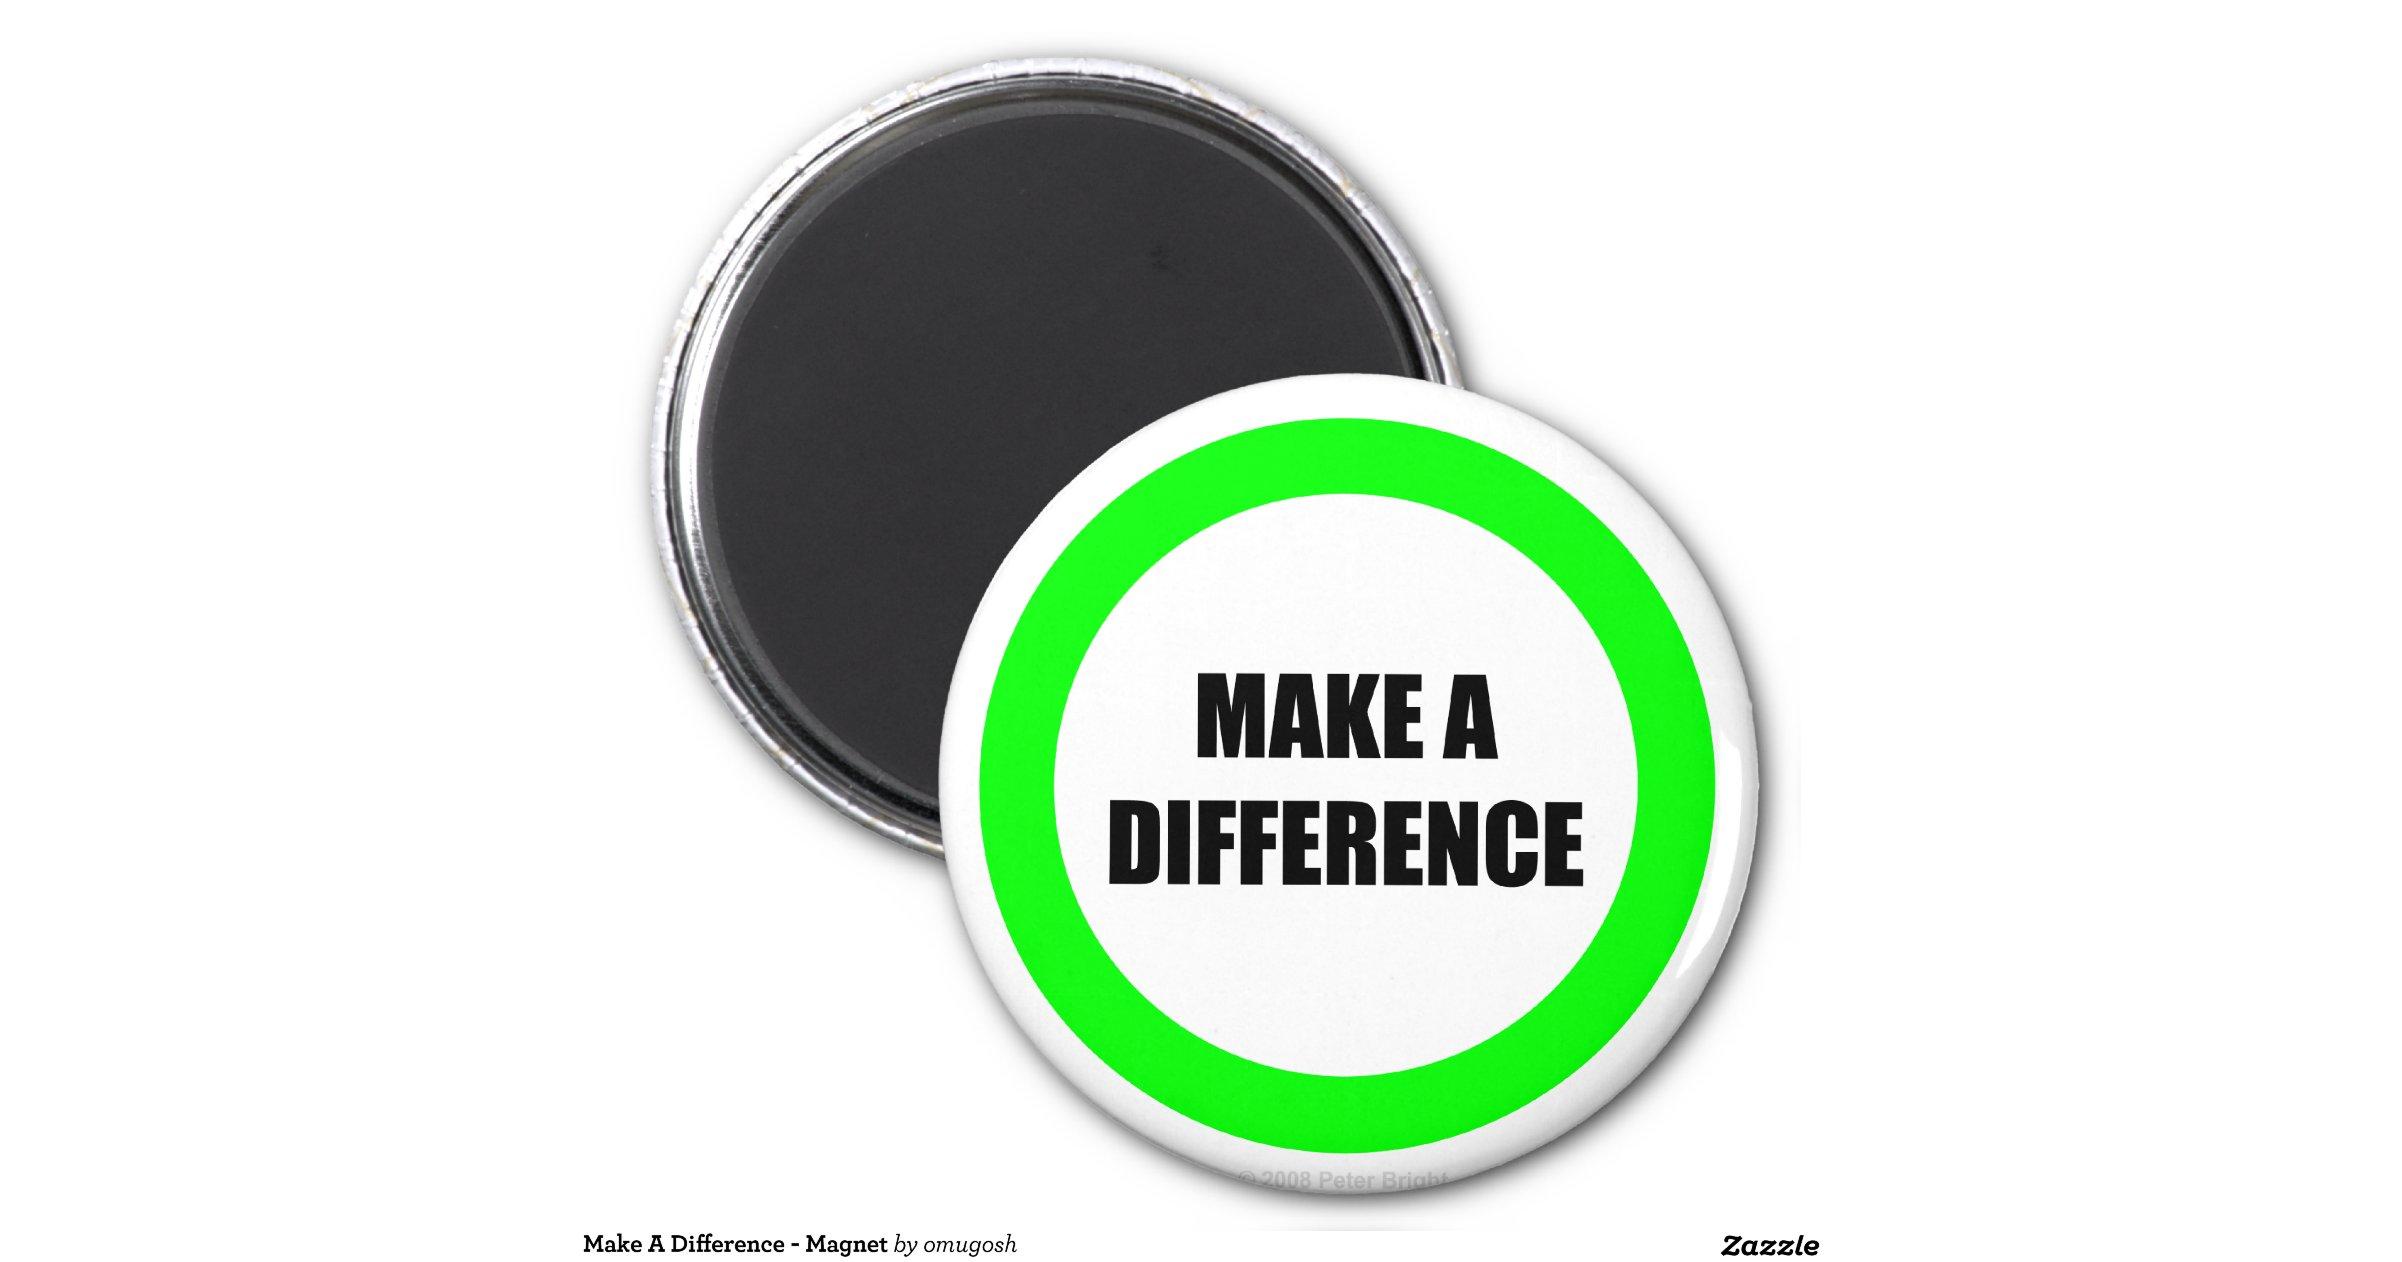 Make A Difference Magnet R1df3fdbba1974e928e77487af9234df6